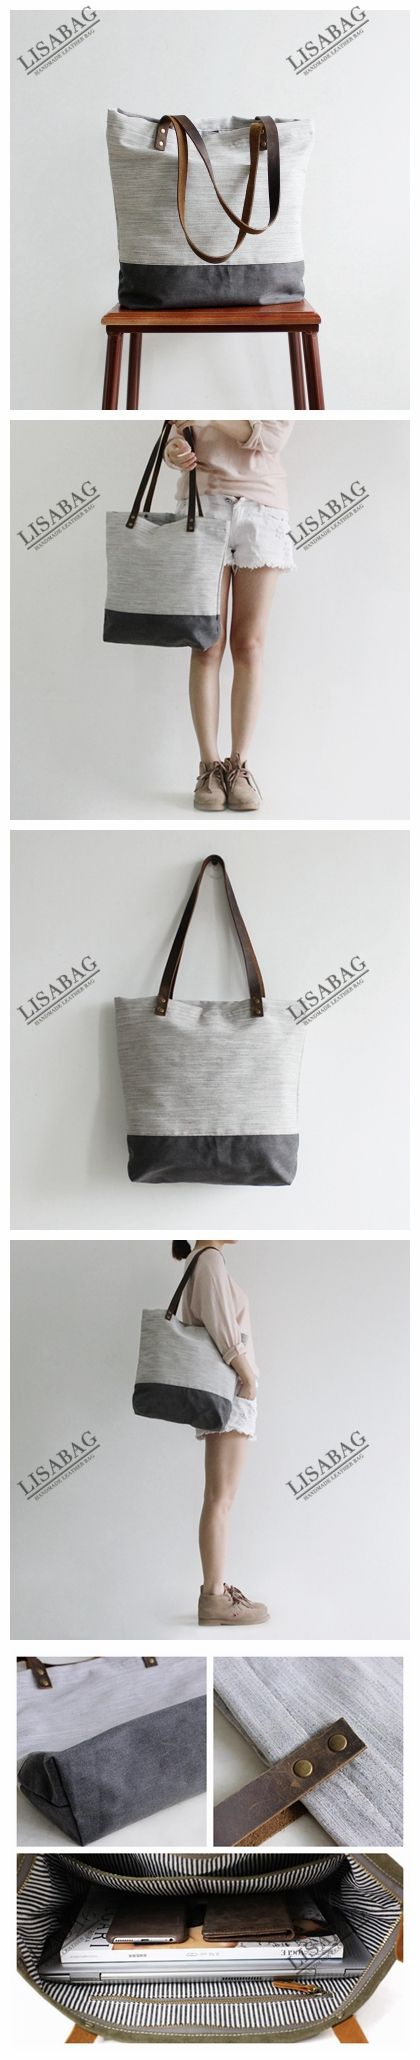 Handcrafted Canvas Tote Bag Shopper Bag Women's Fashion Handbag Gym Bag 14040--LISABAG